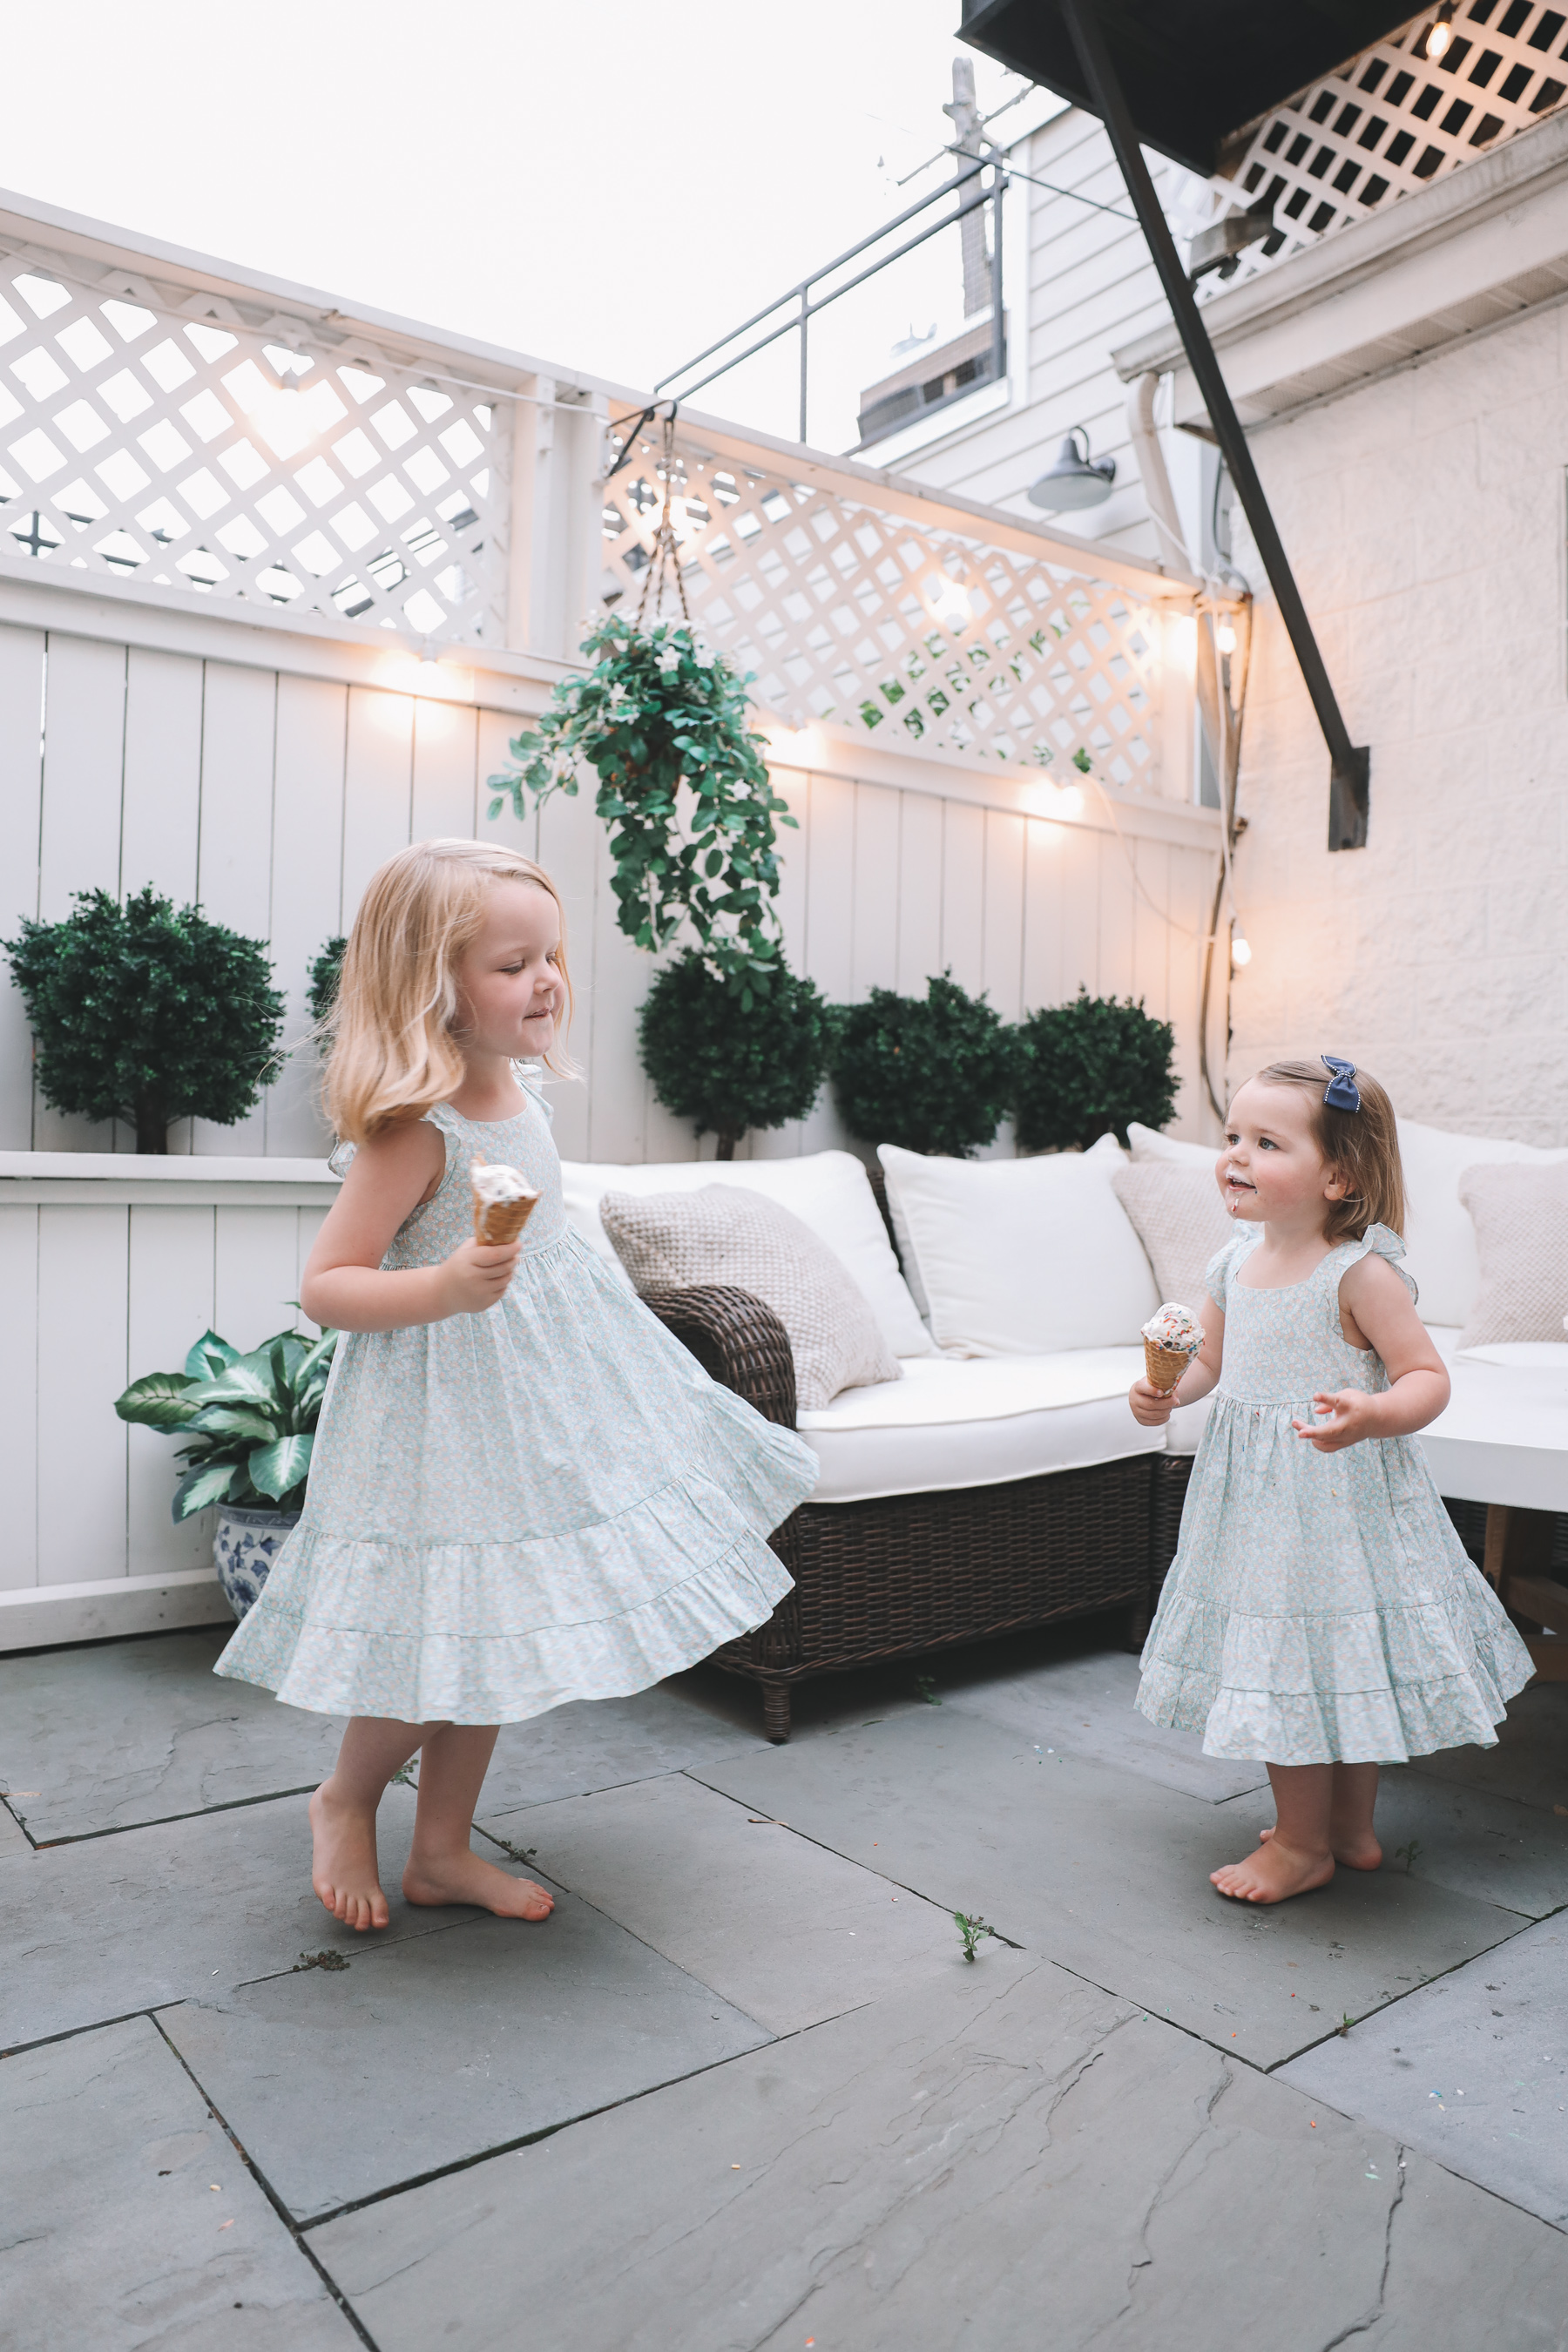 kids eating summer treats